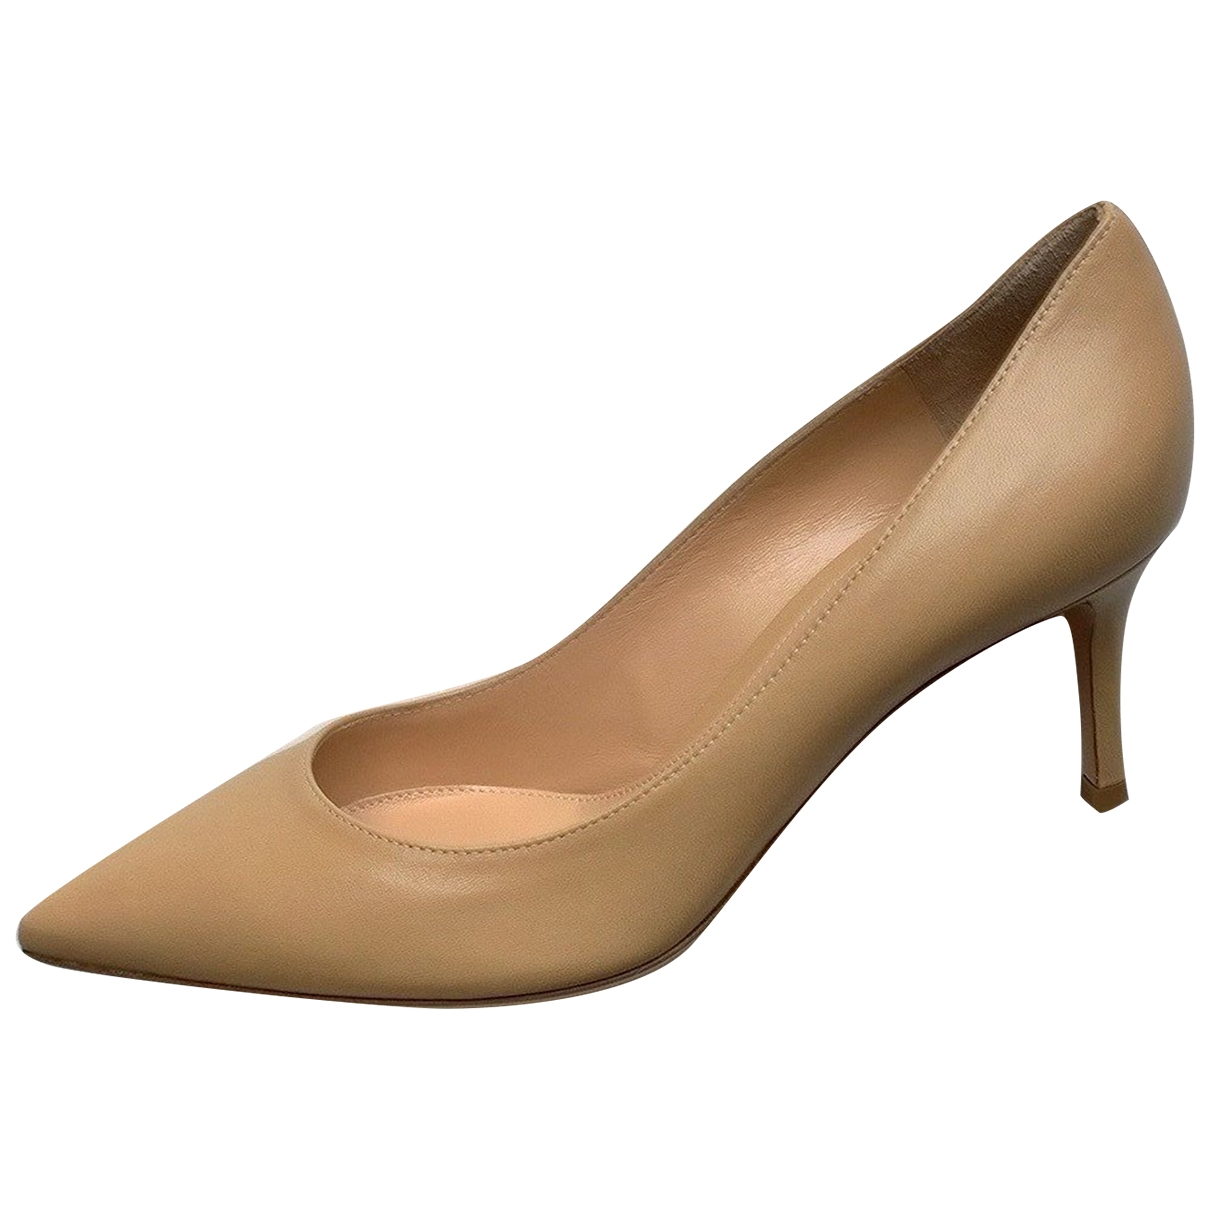 Gianvito Rossi Gianvito Beige Leather Heels for Women 41.5 IT